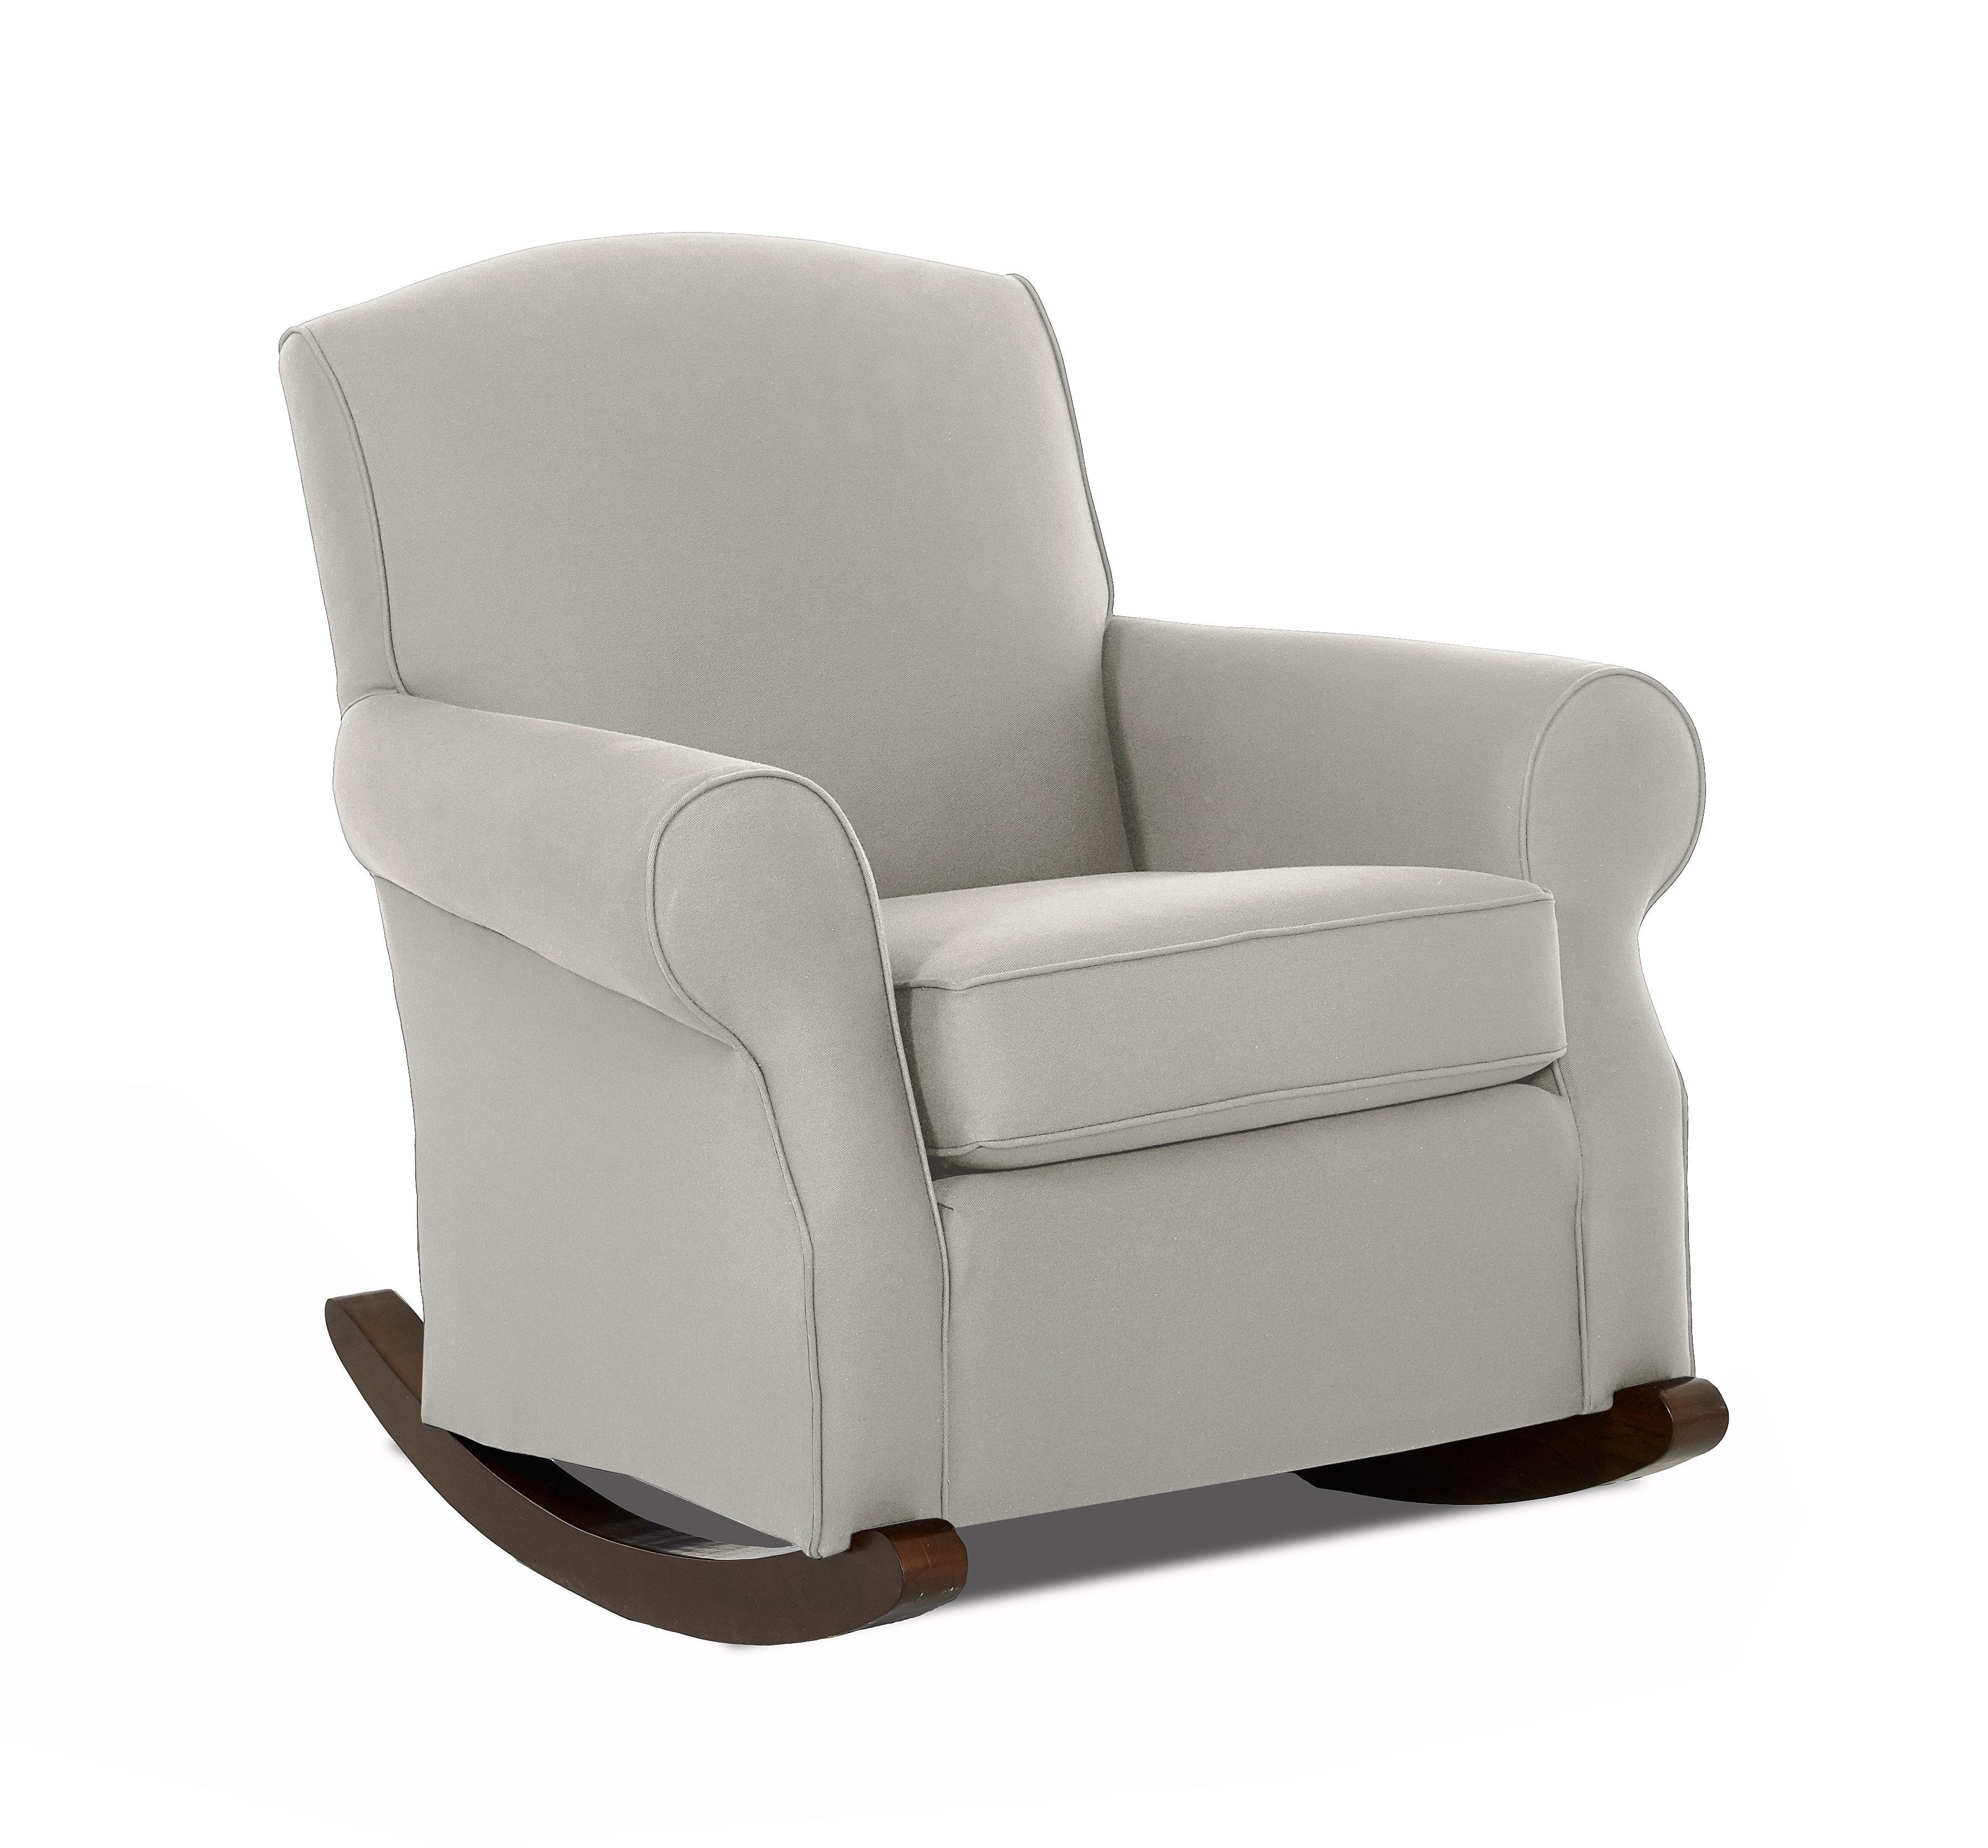 Wayfair Custom Upholstery™ Marlowe Rocking Chair | Wayfair In Katrina Beige Swivel Glider Chairs (View 3 of 25)